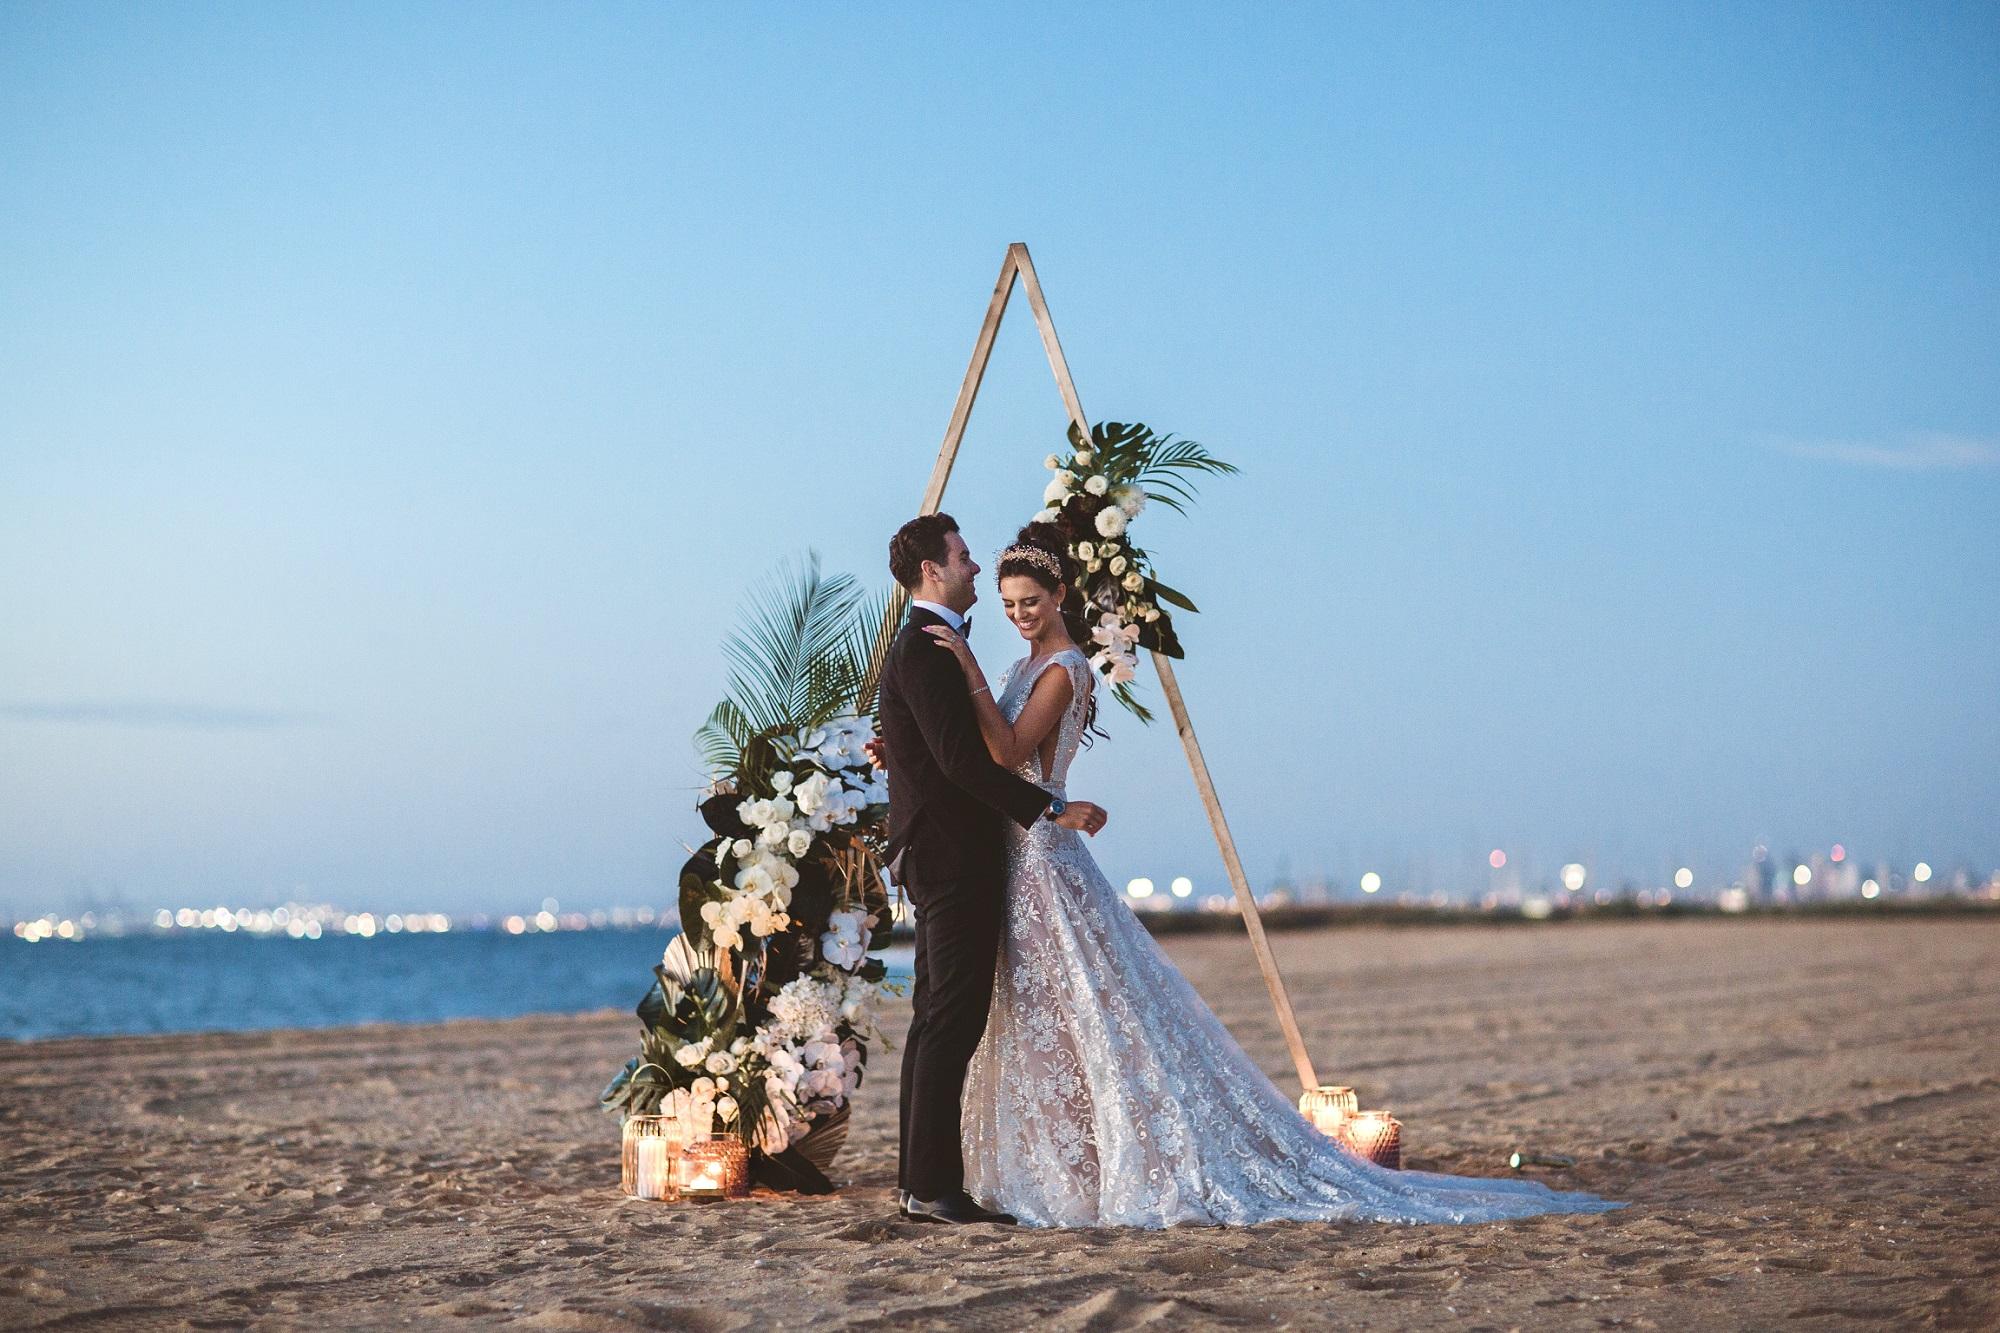 Beach wedding venue ceremony